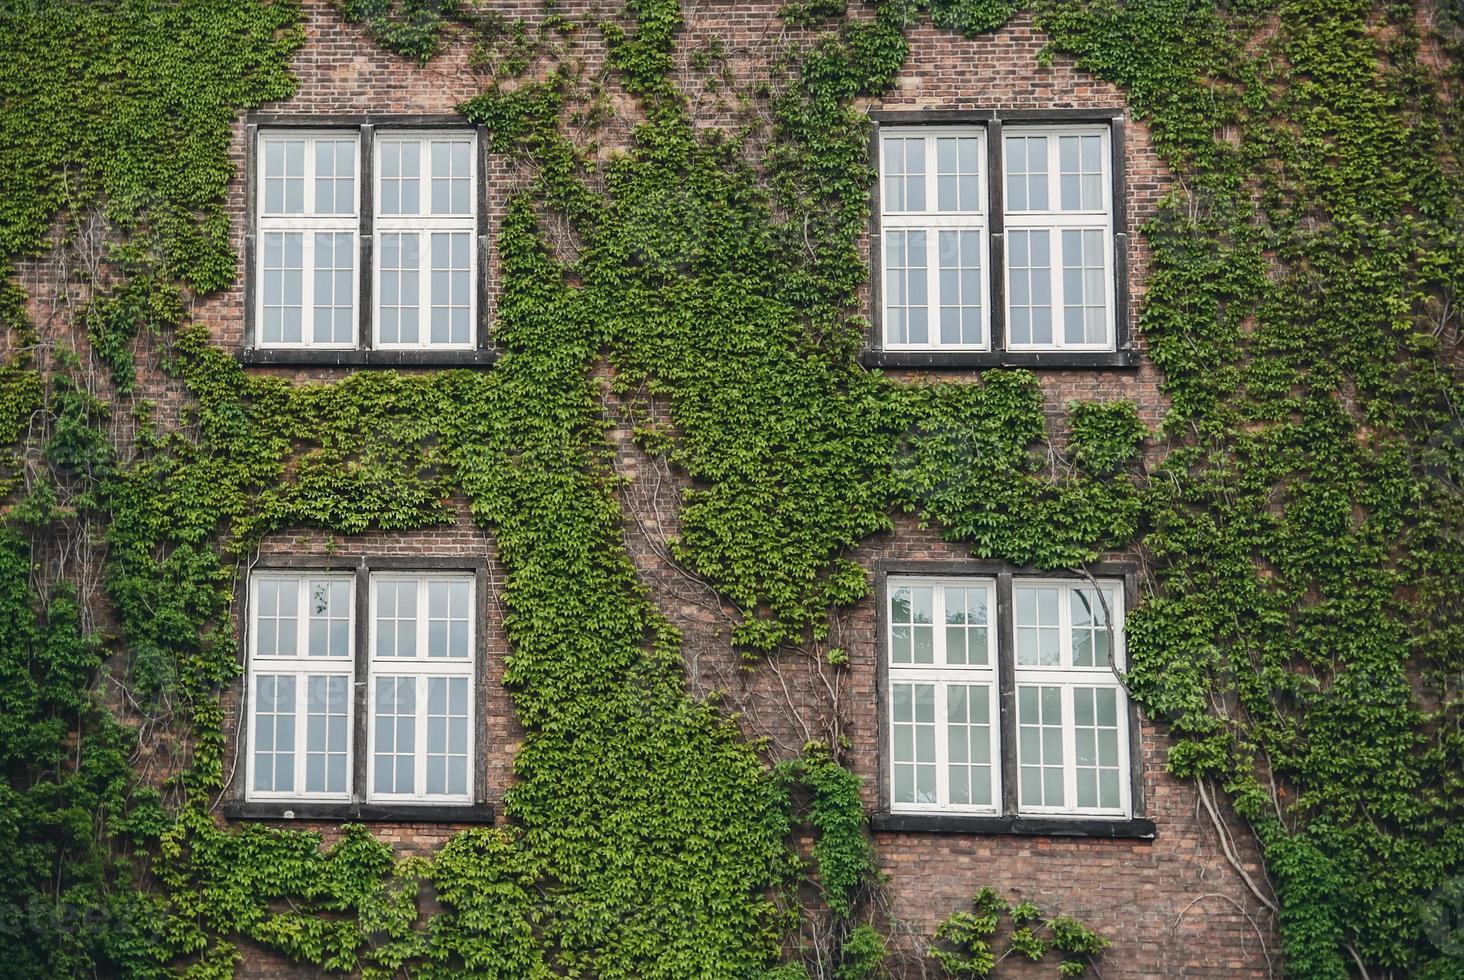 finestre in una vecchia casa di campagna foto